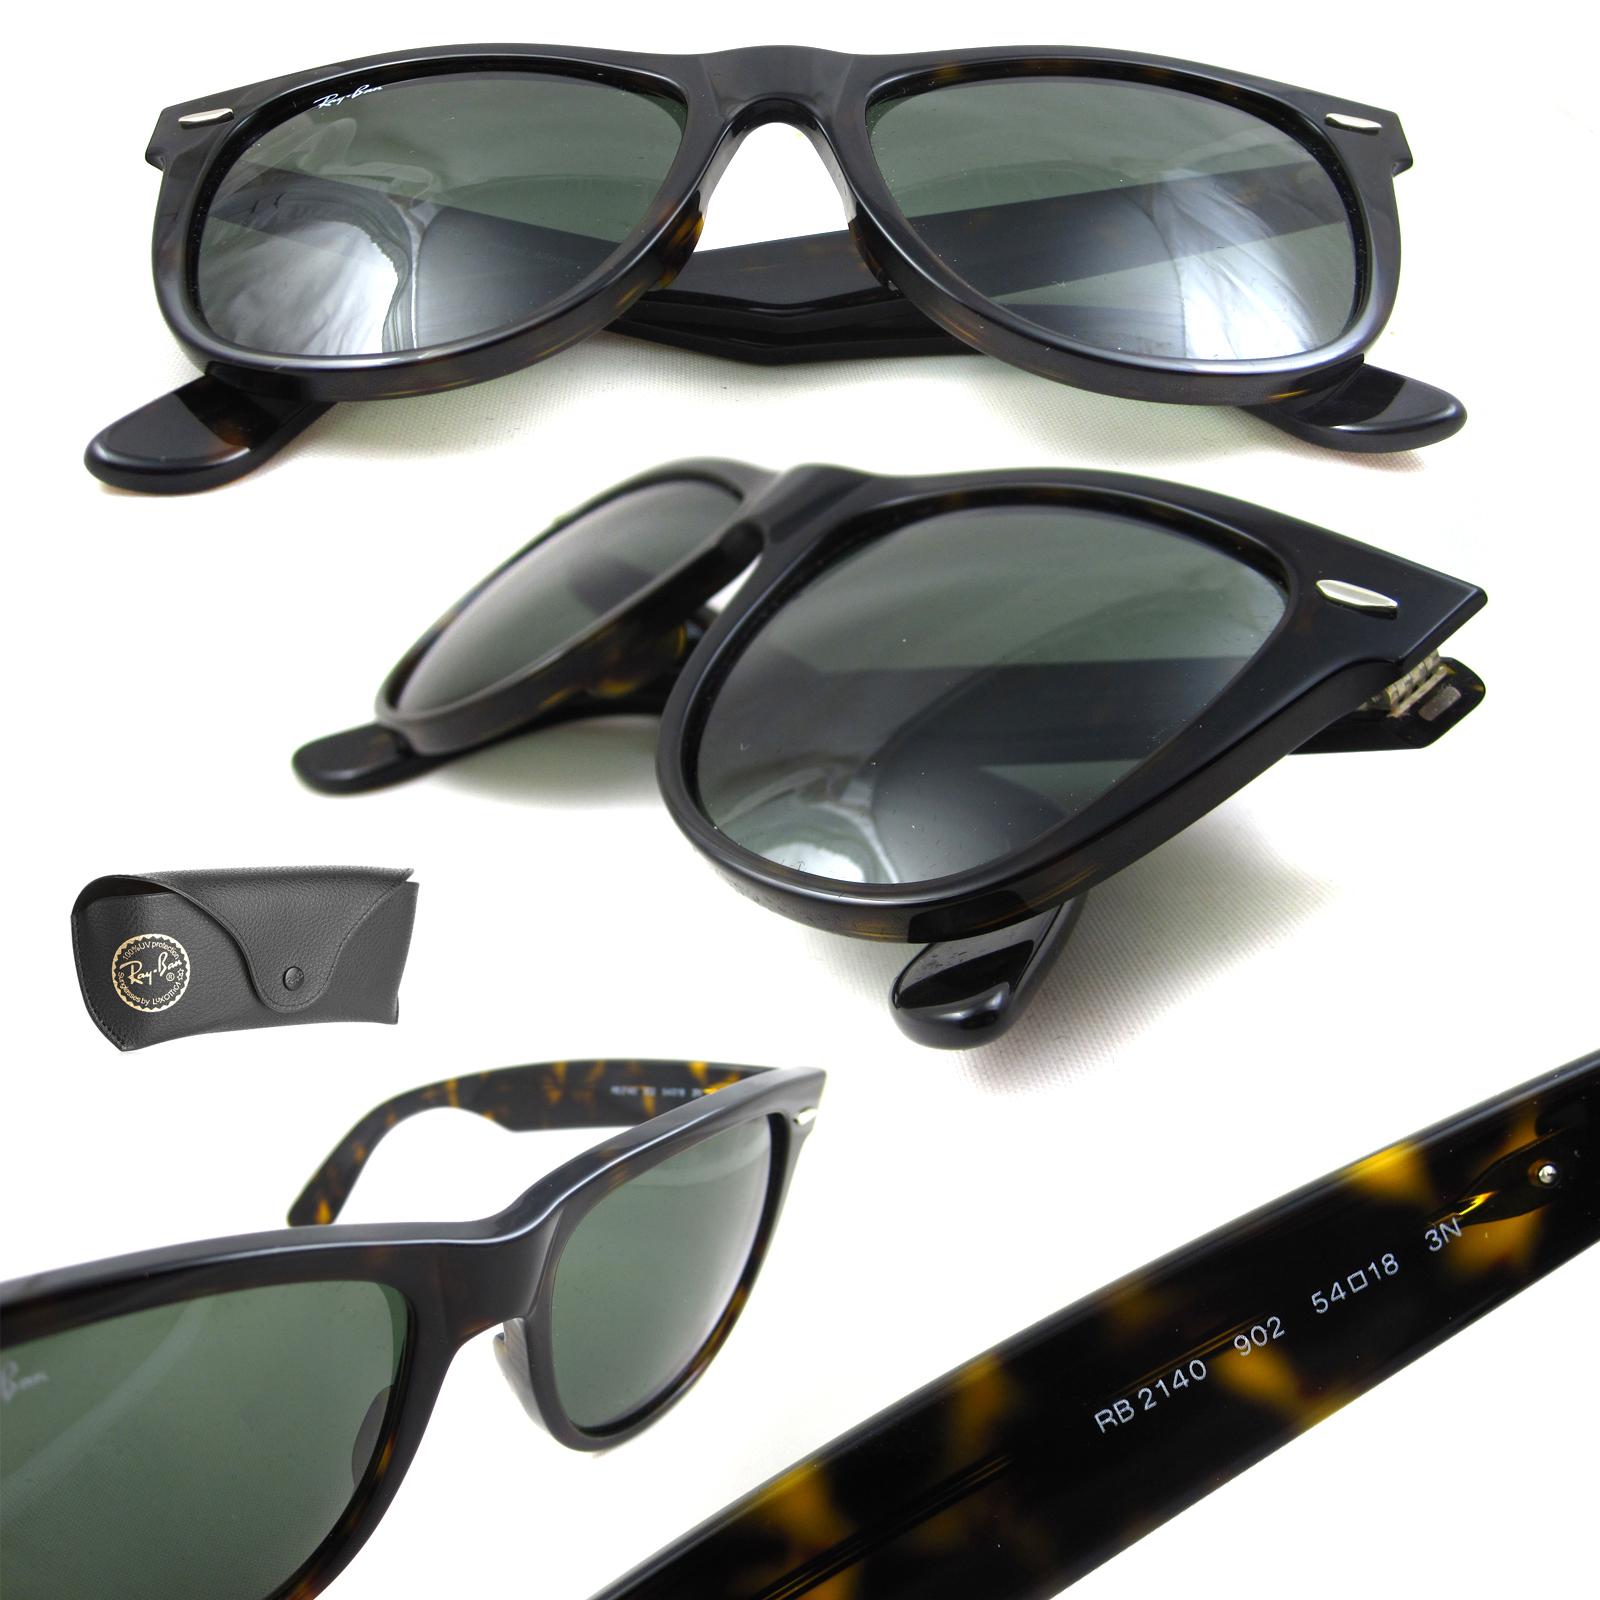 ray ban wayfarer 2140 tortoise  Ray-Ban Sunglasses Wayfarer 2140 902 Tortoise Green G-15 Large 54mm